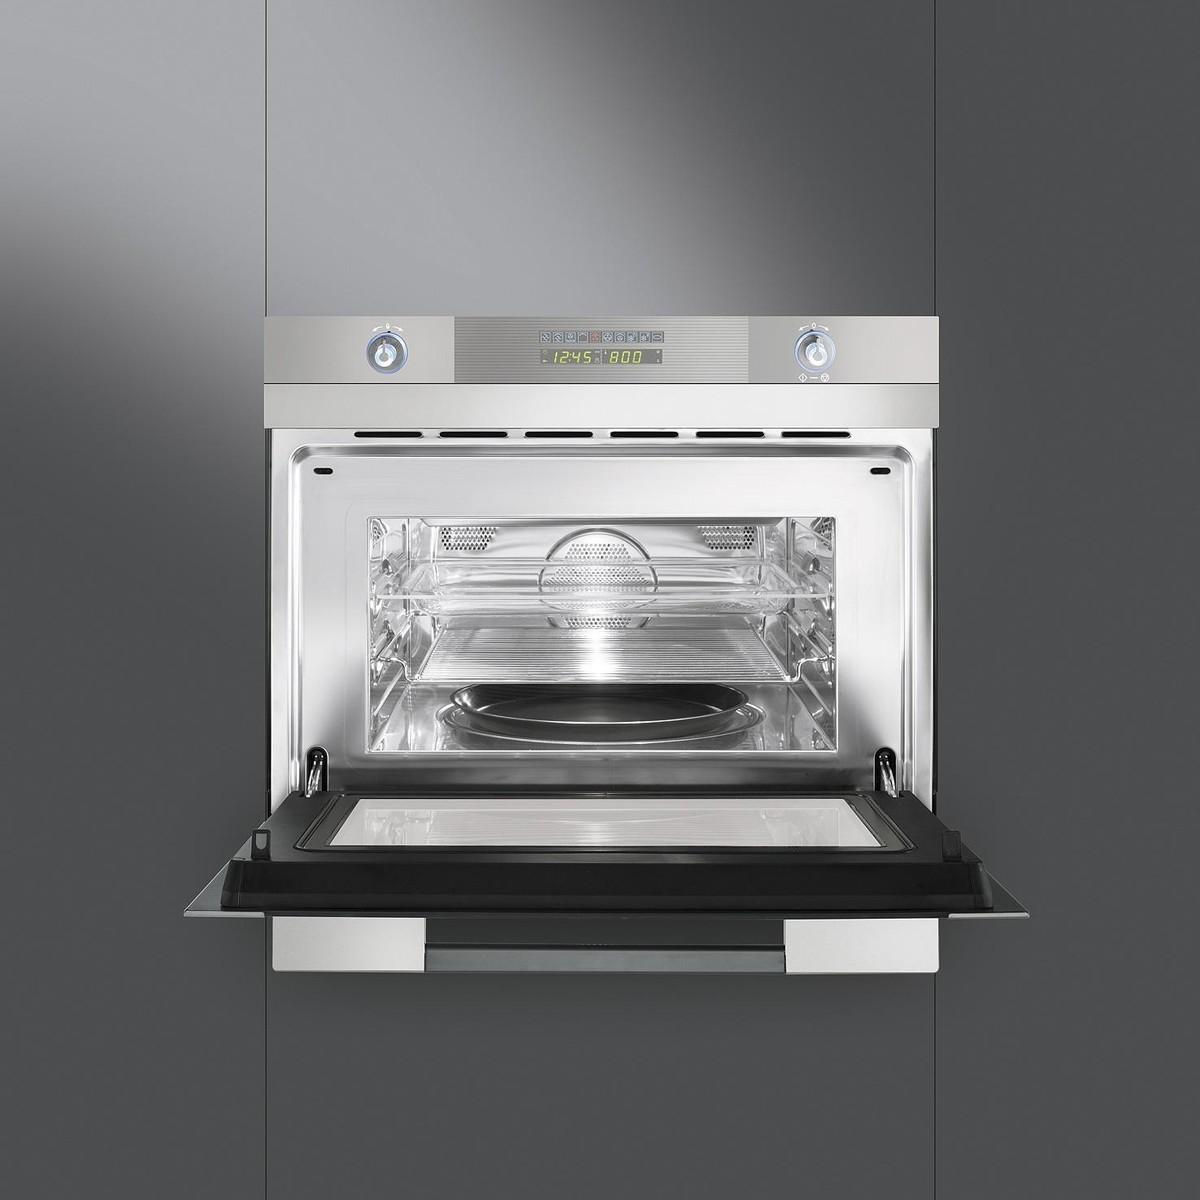 Sc45mc inset microwave oven smeg ambientedirectcom for Smeg küche